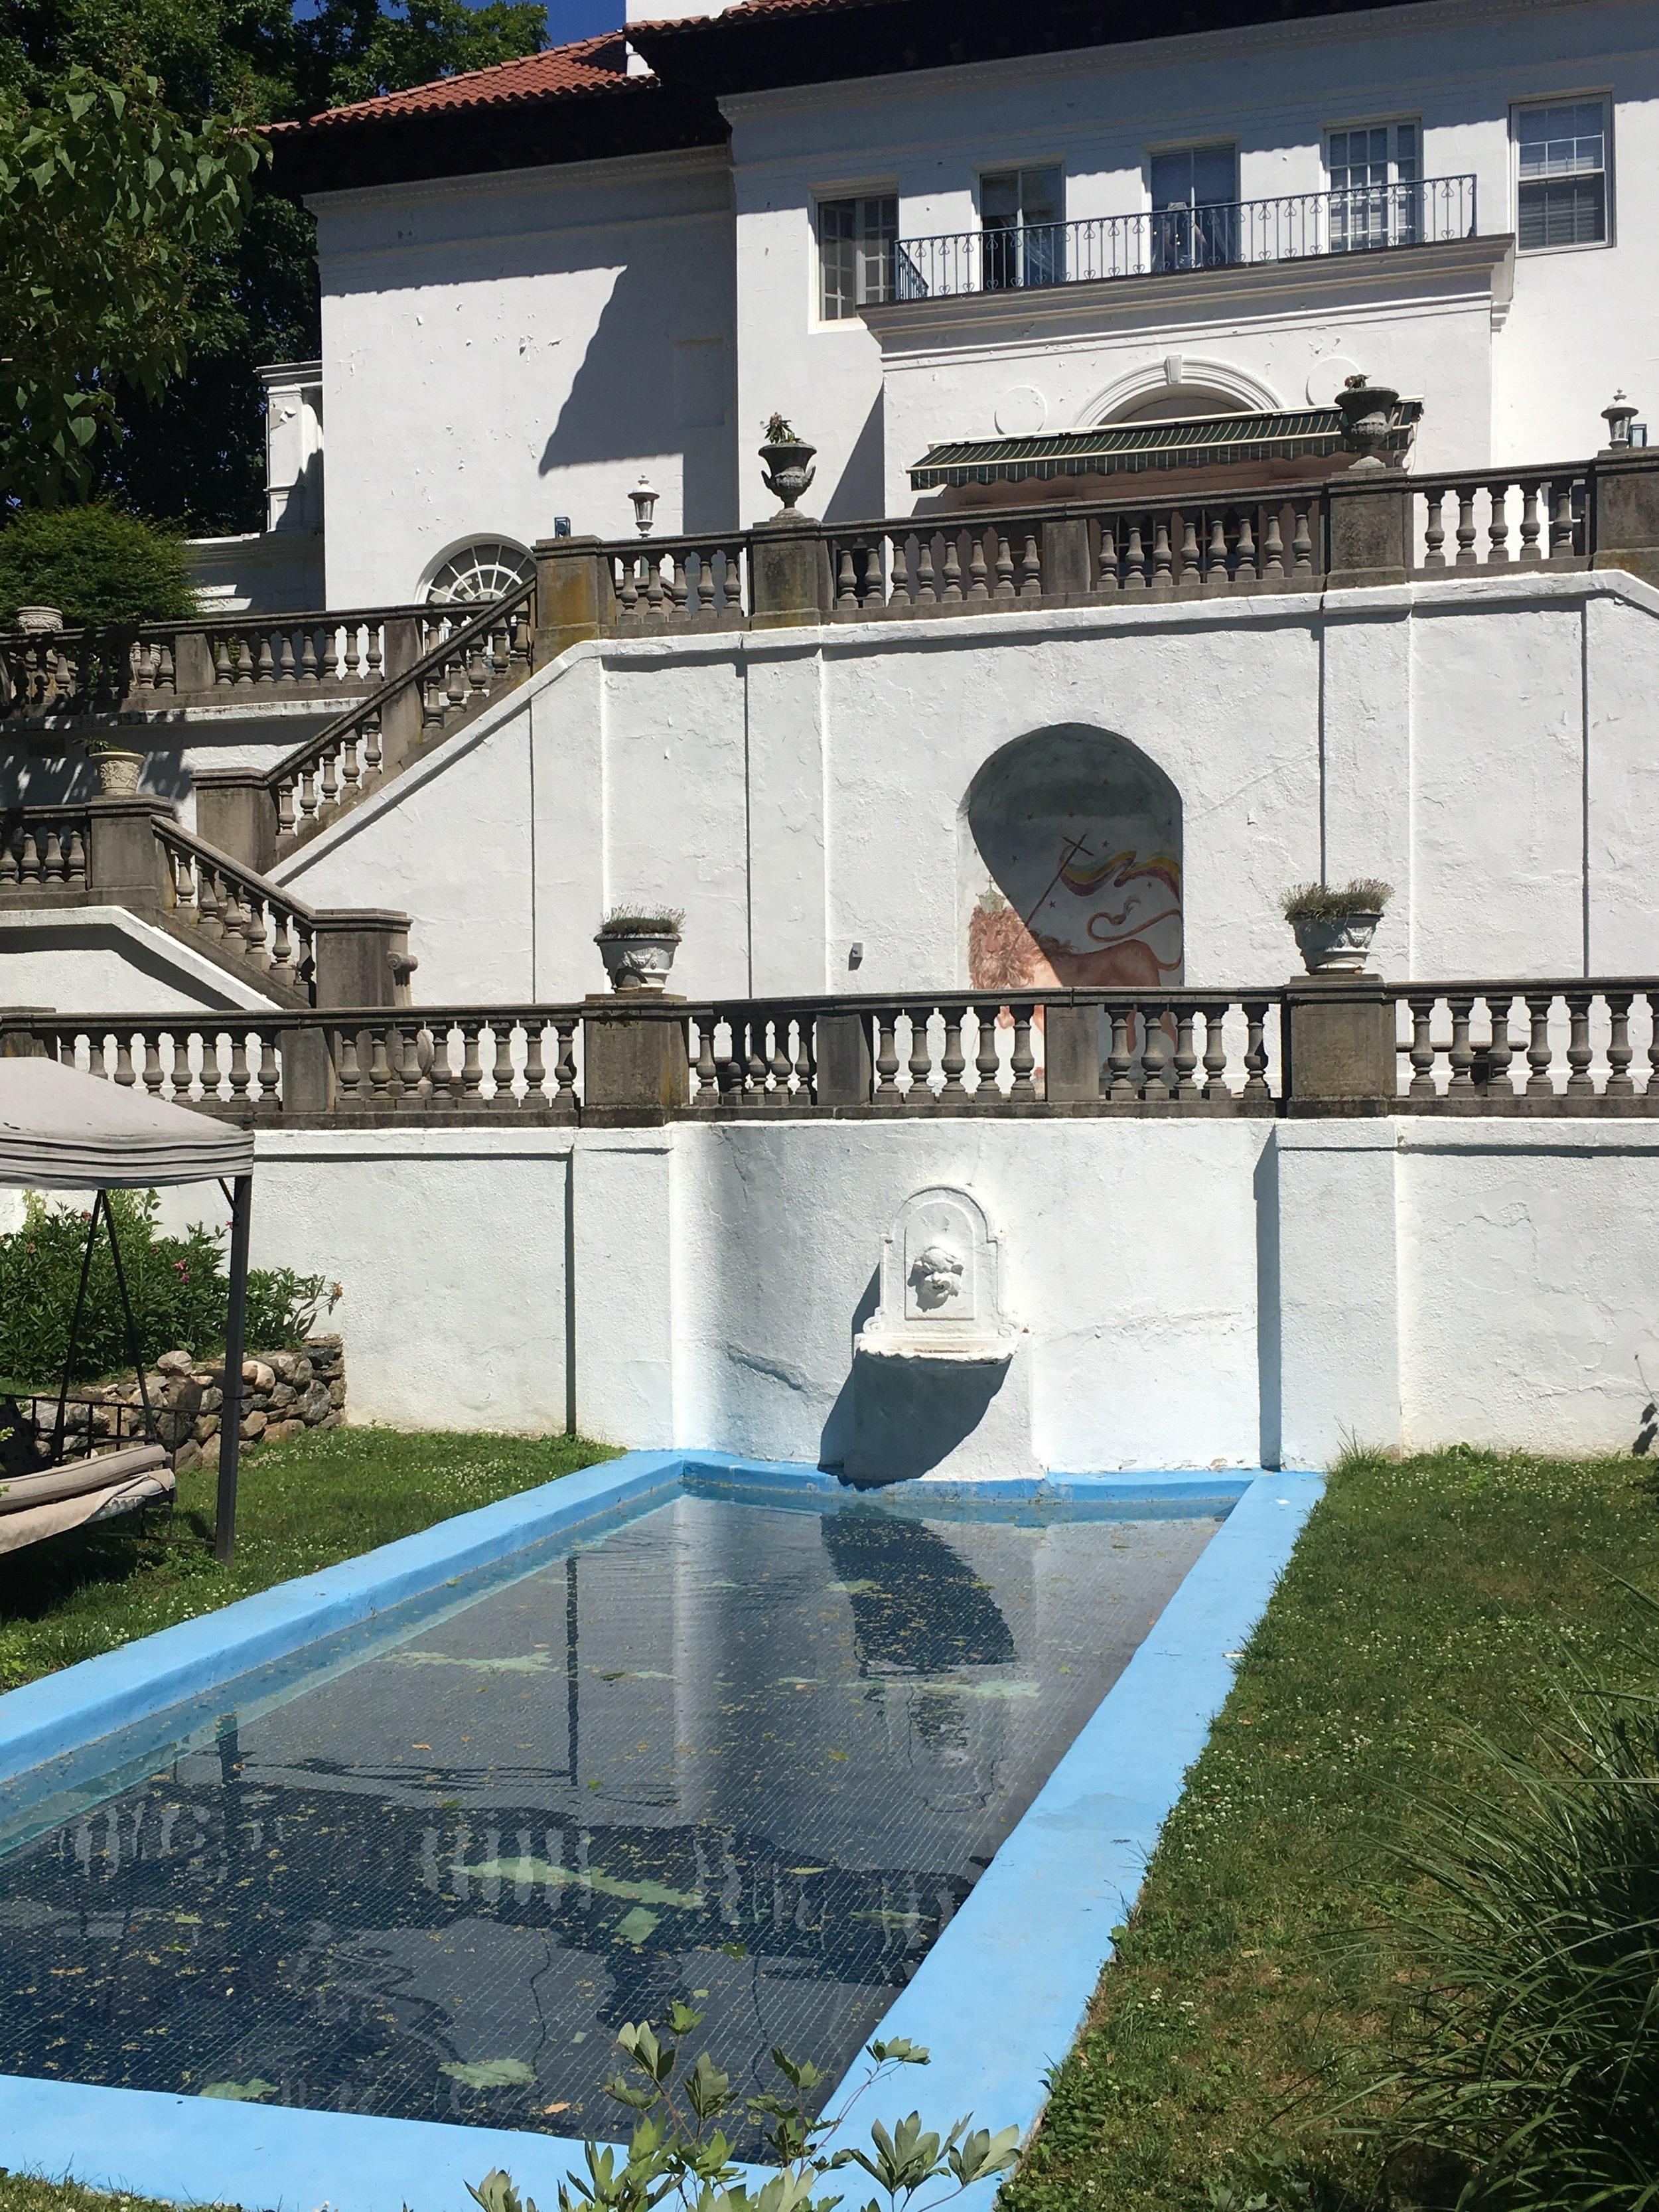 Pool at Villa Lewaro - Photo By Tevra F.